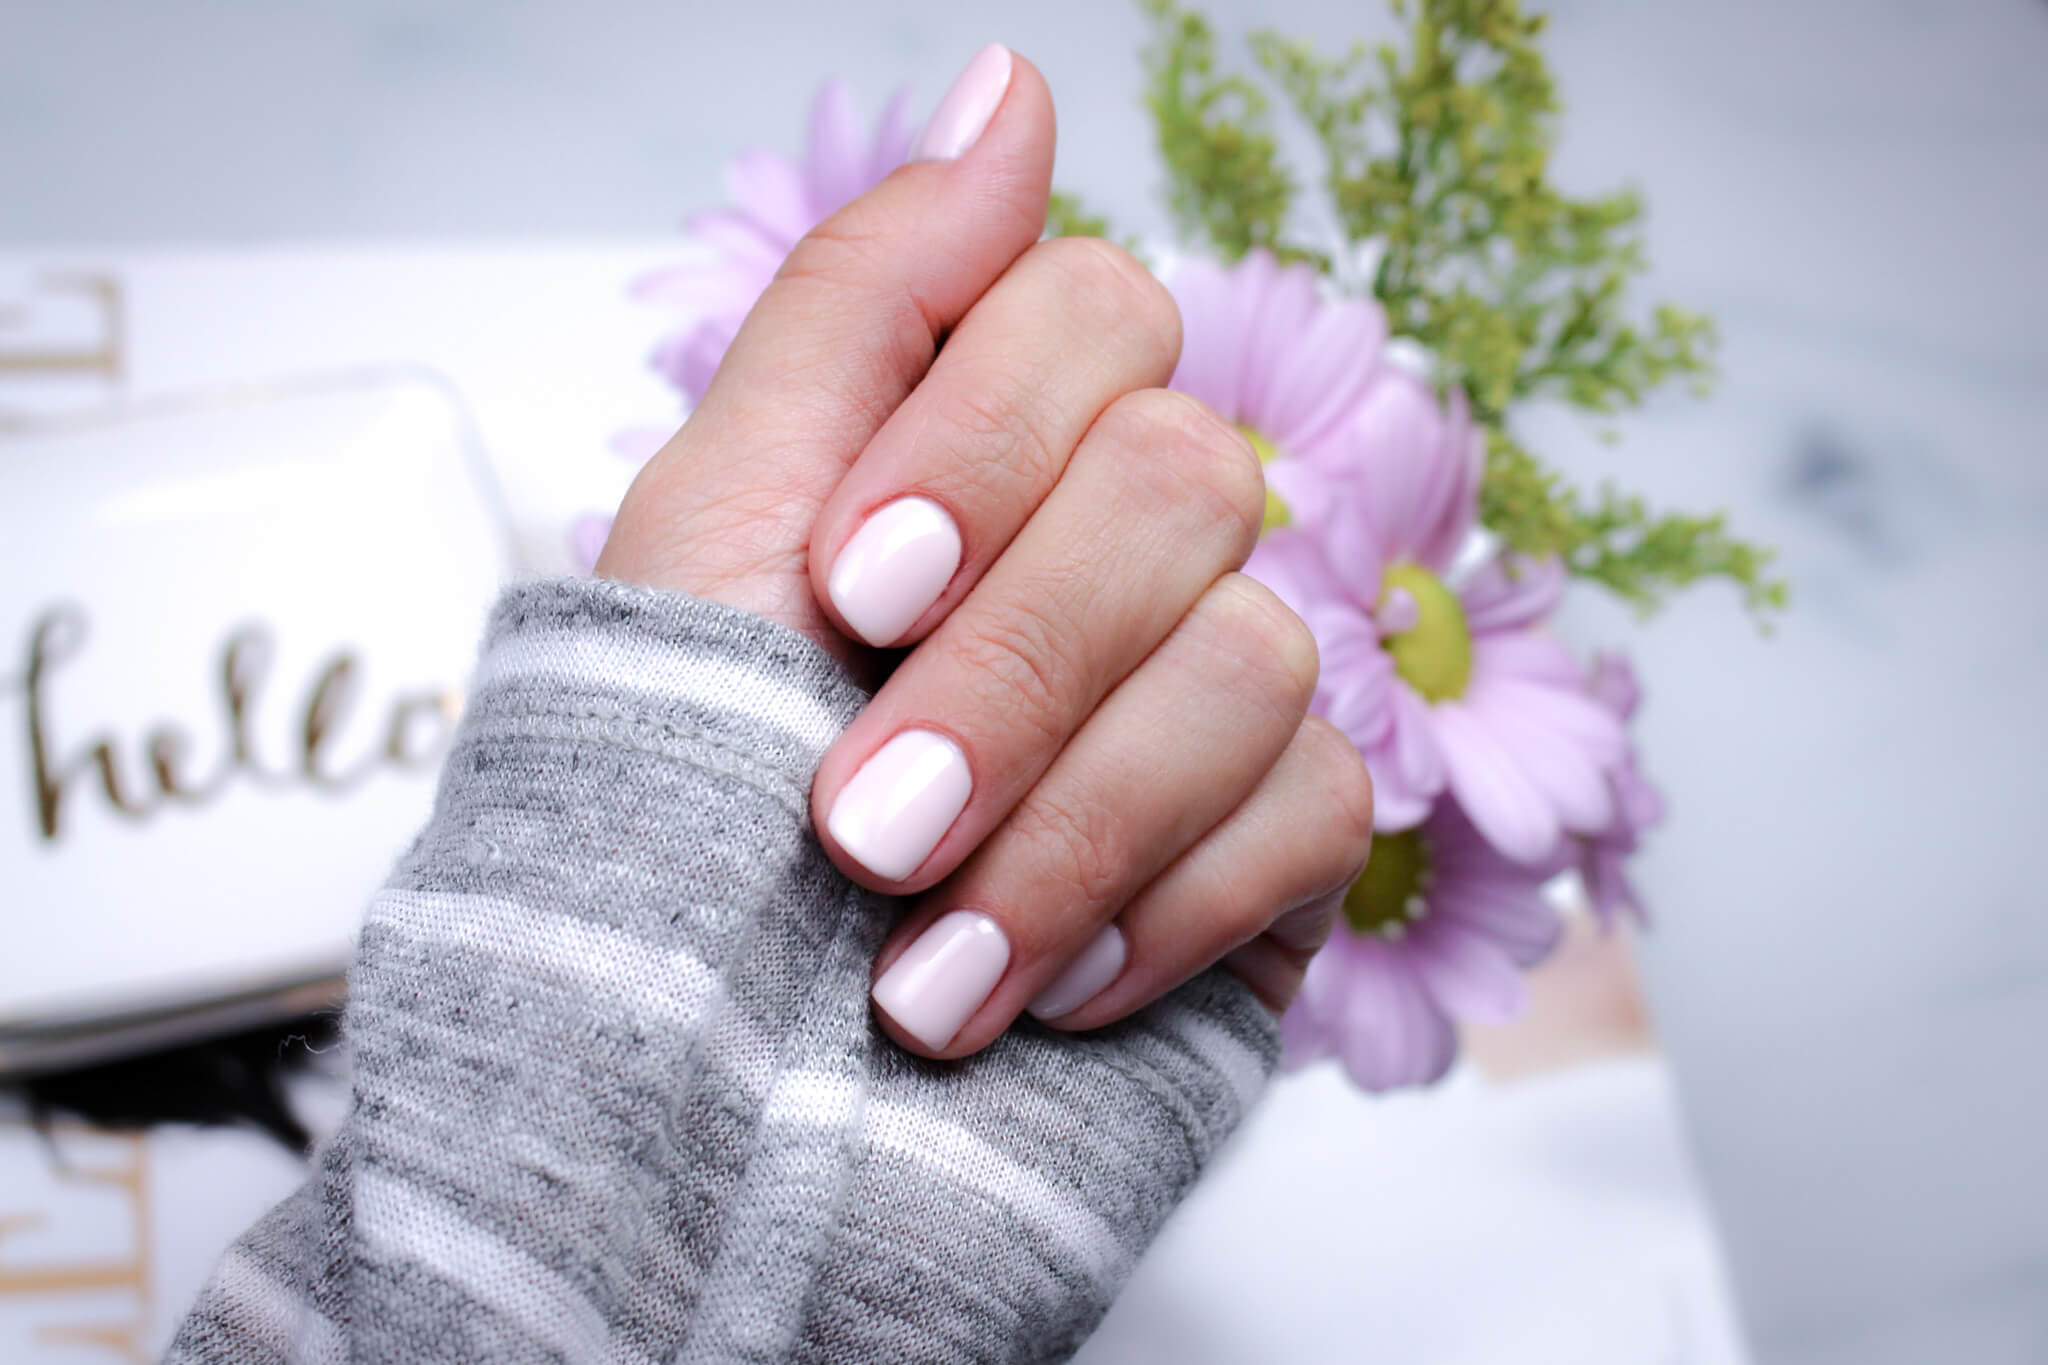 Schöne Nägel mit UV-Nagellack - so geht\'s! - tantedine